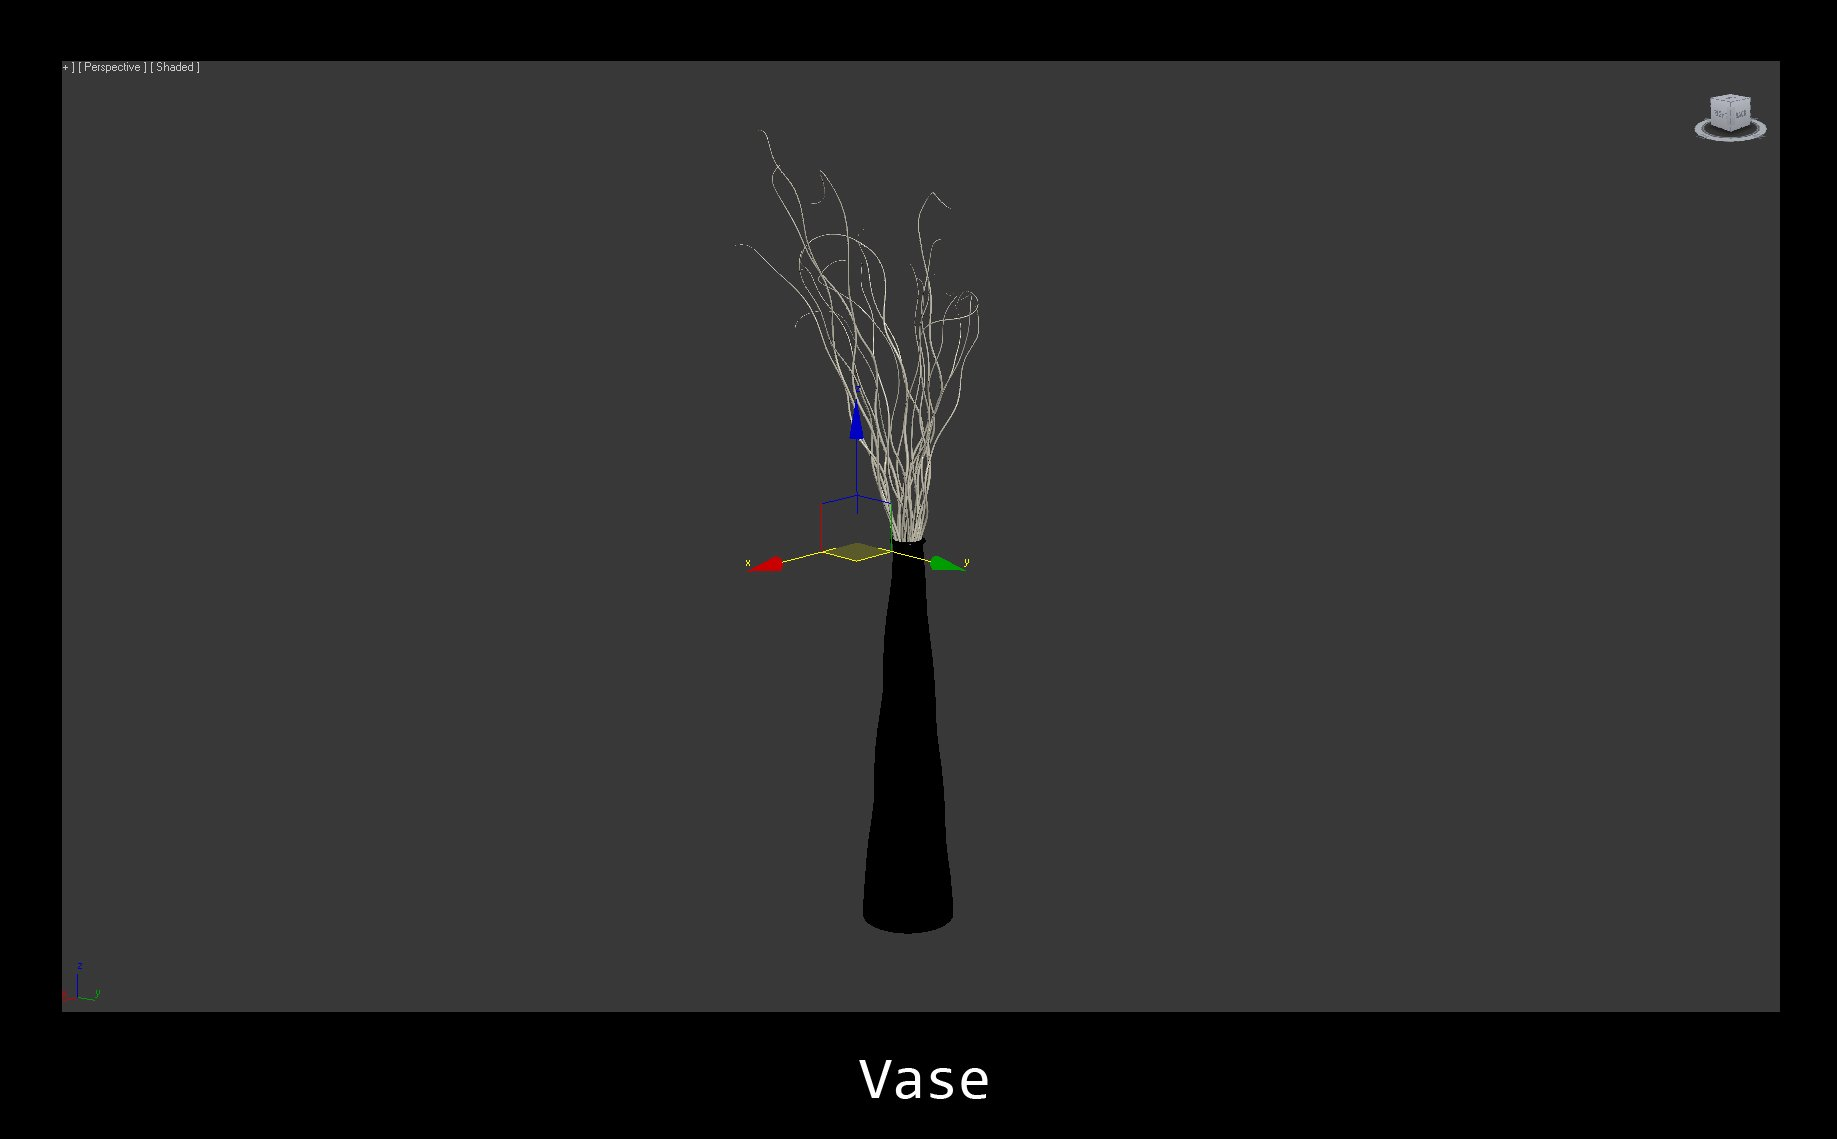 09_Vase_evermotion.jpg